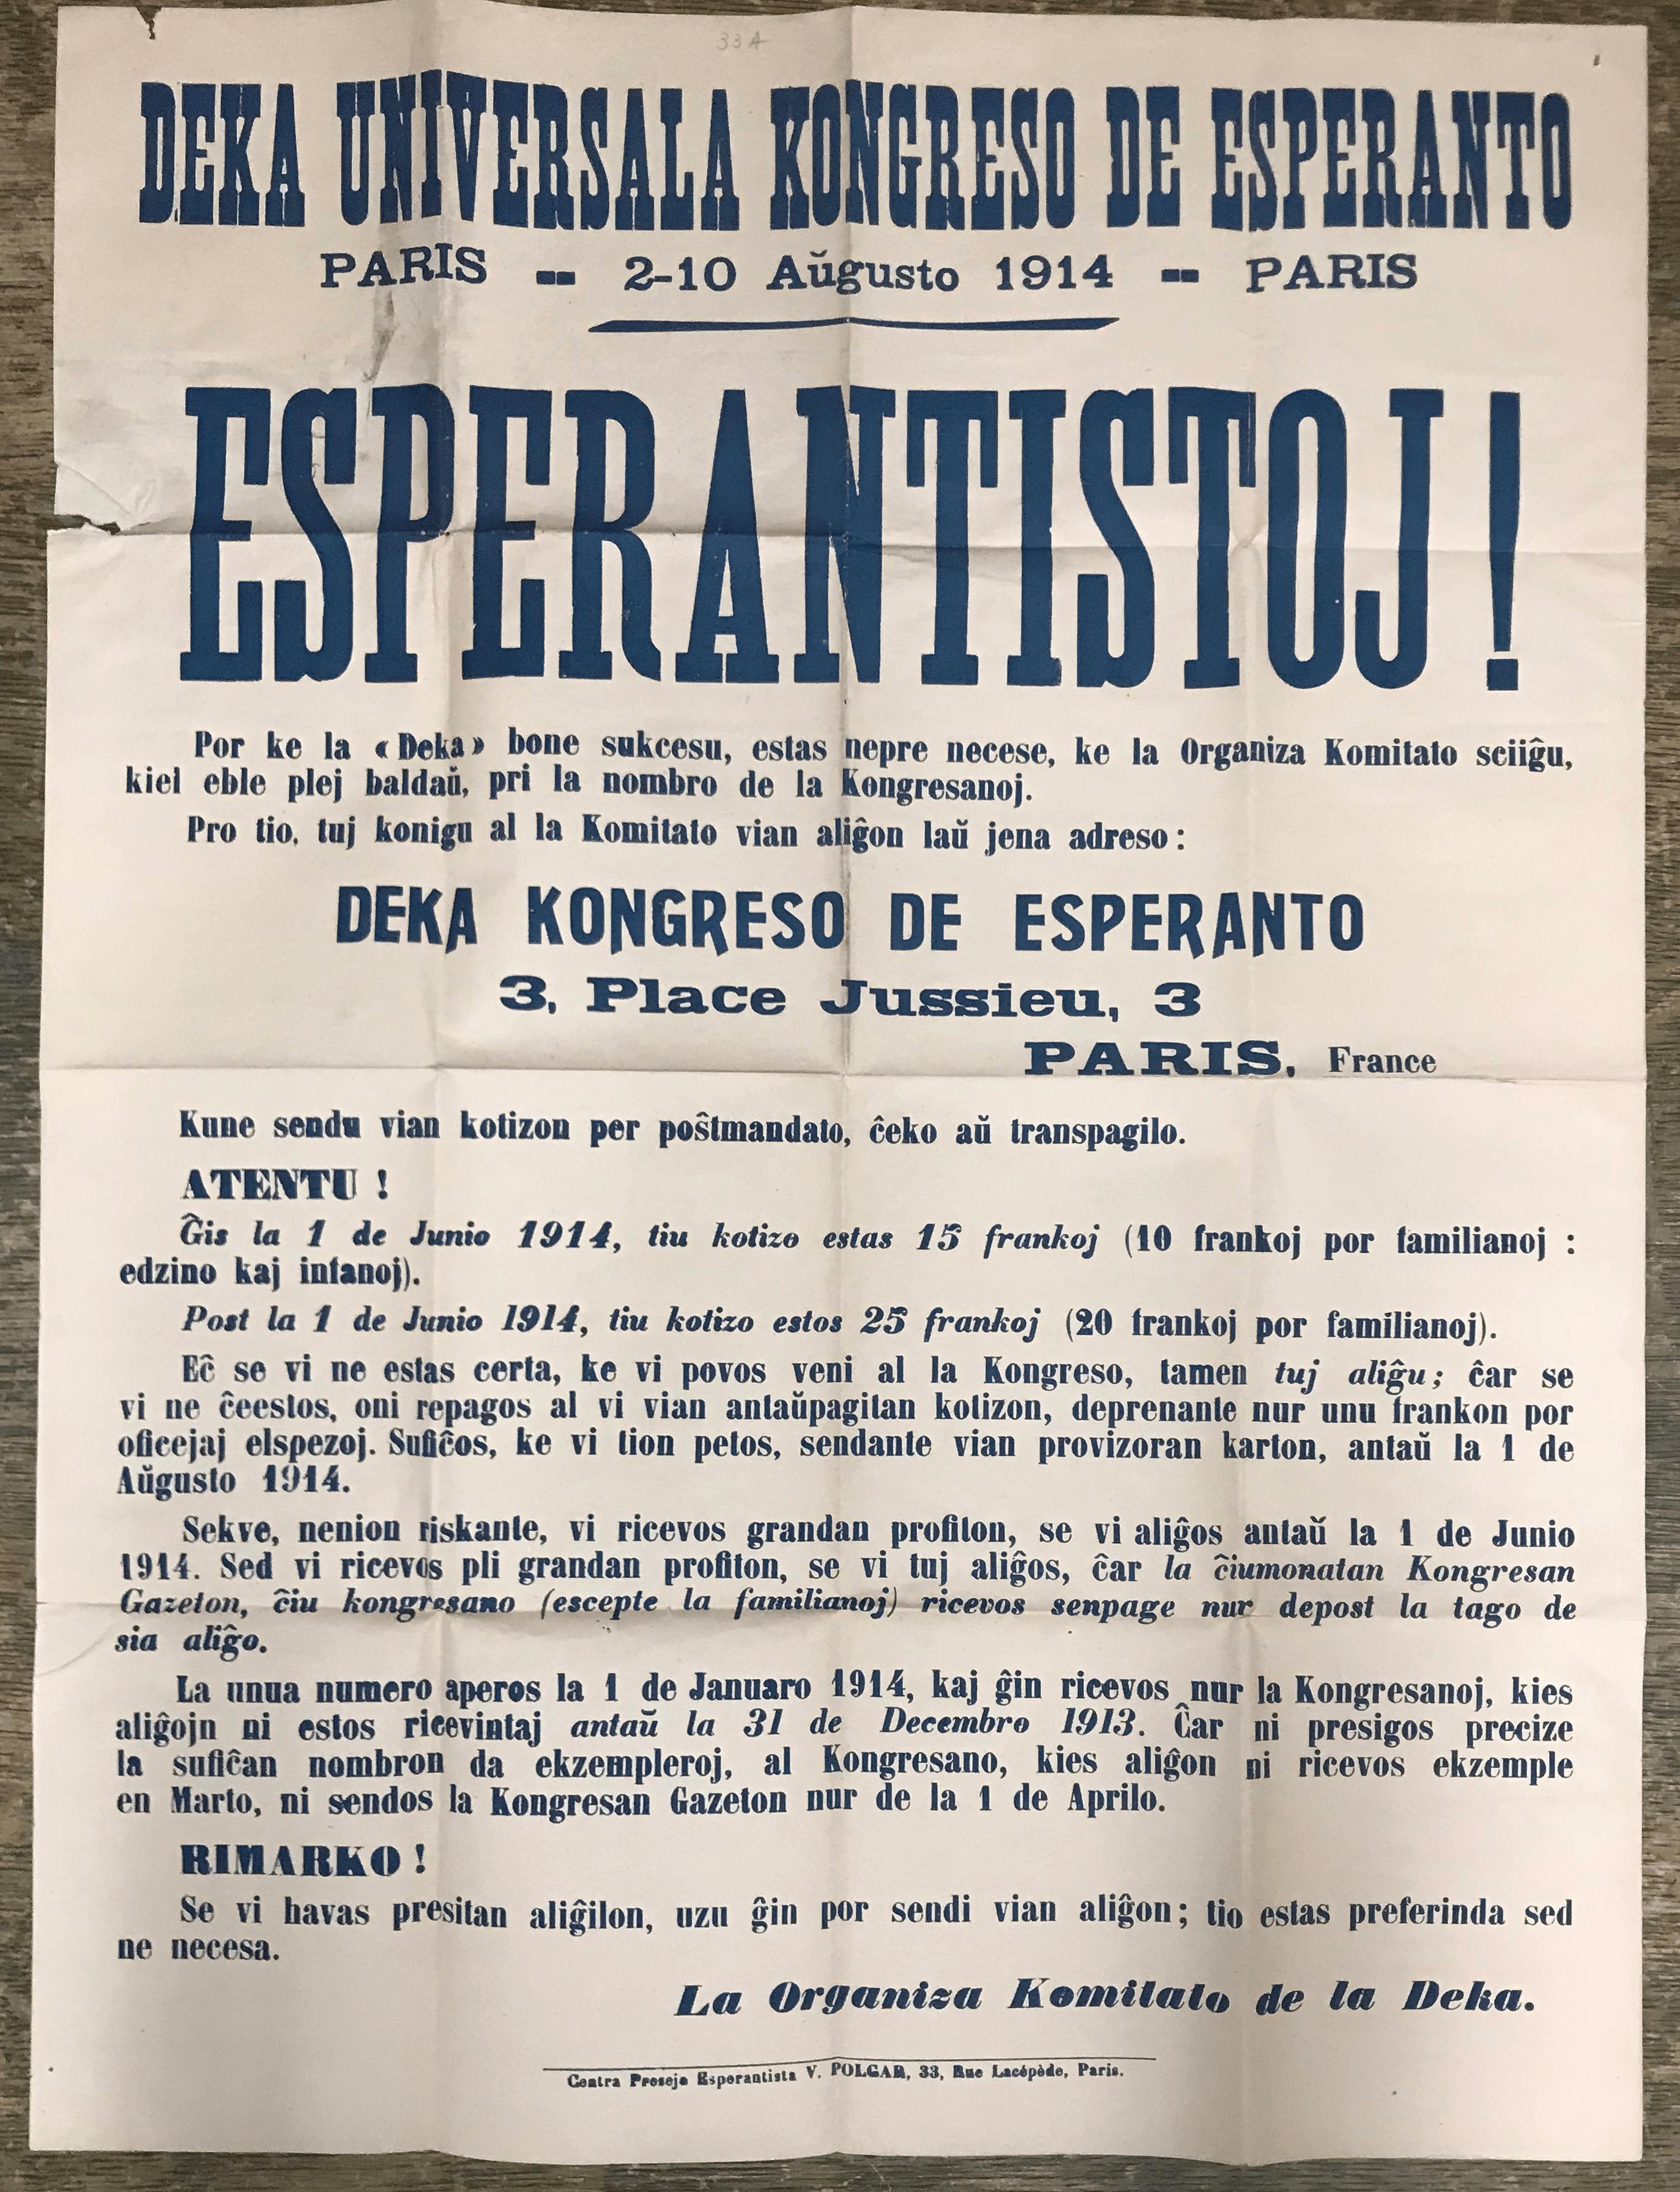 Universala Kongreso de Esperanto conference poster, Paris 1914